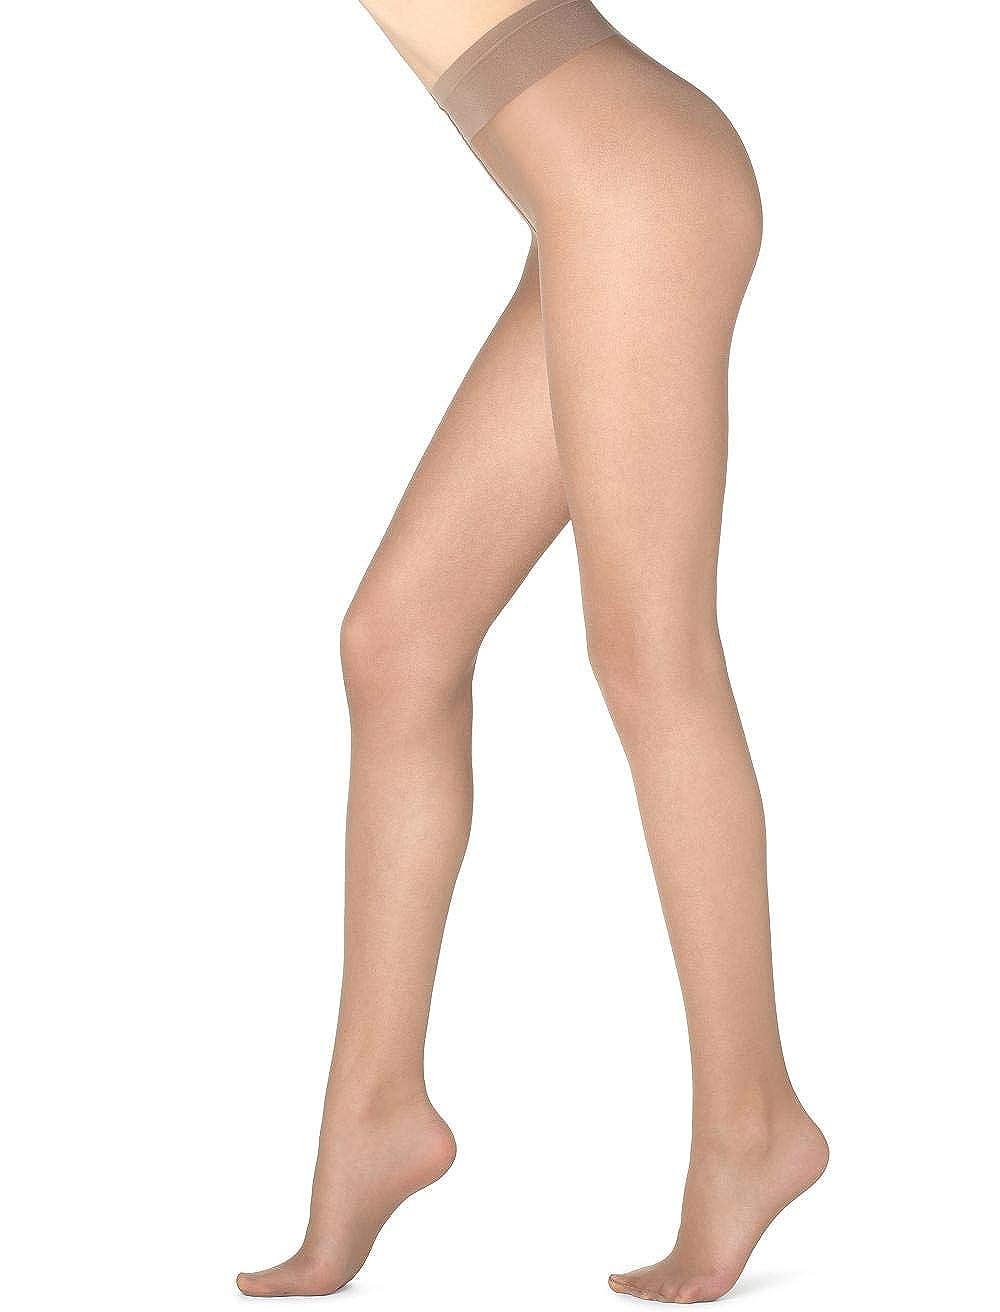 215cd71ed Calzedonia Womens 40 Denier Sheer Tights  Amazon.co.uk  Clothing